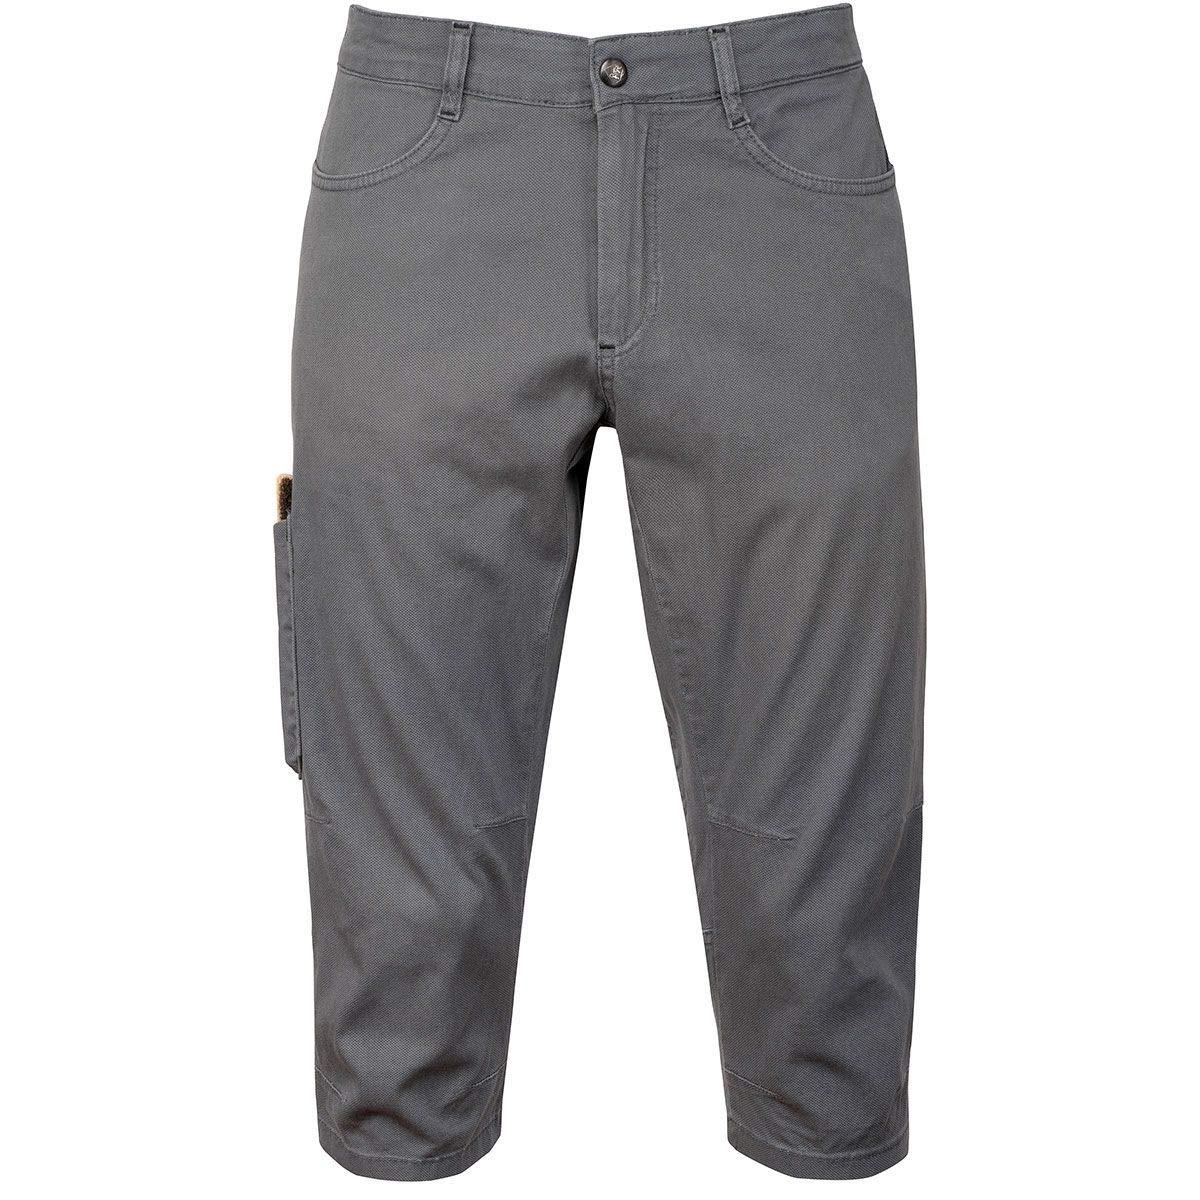 Chillaz Herren Elias 3//4 Hose Pants Kurze Hose neu